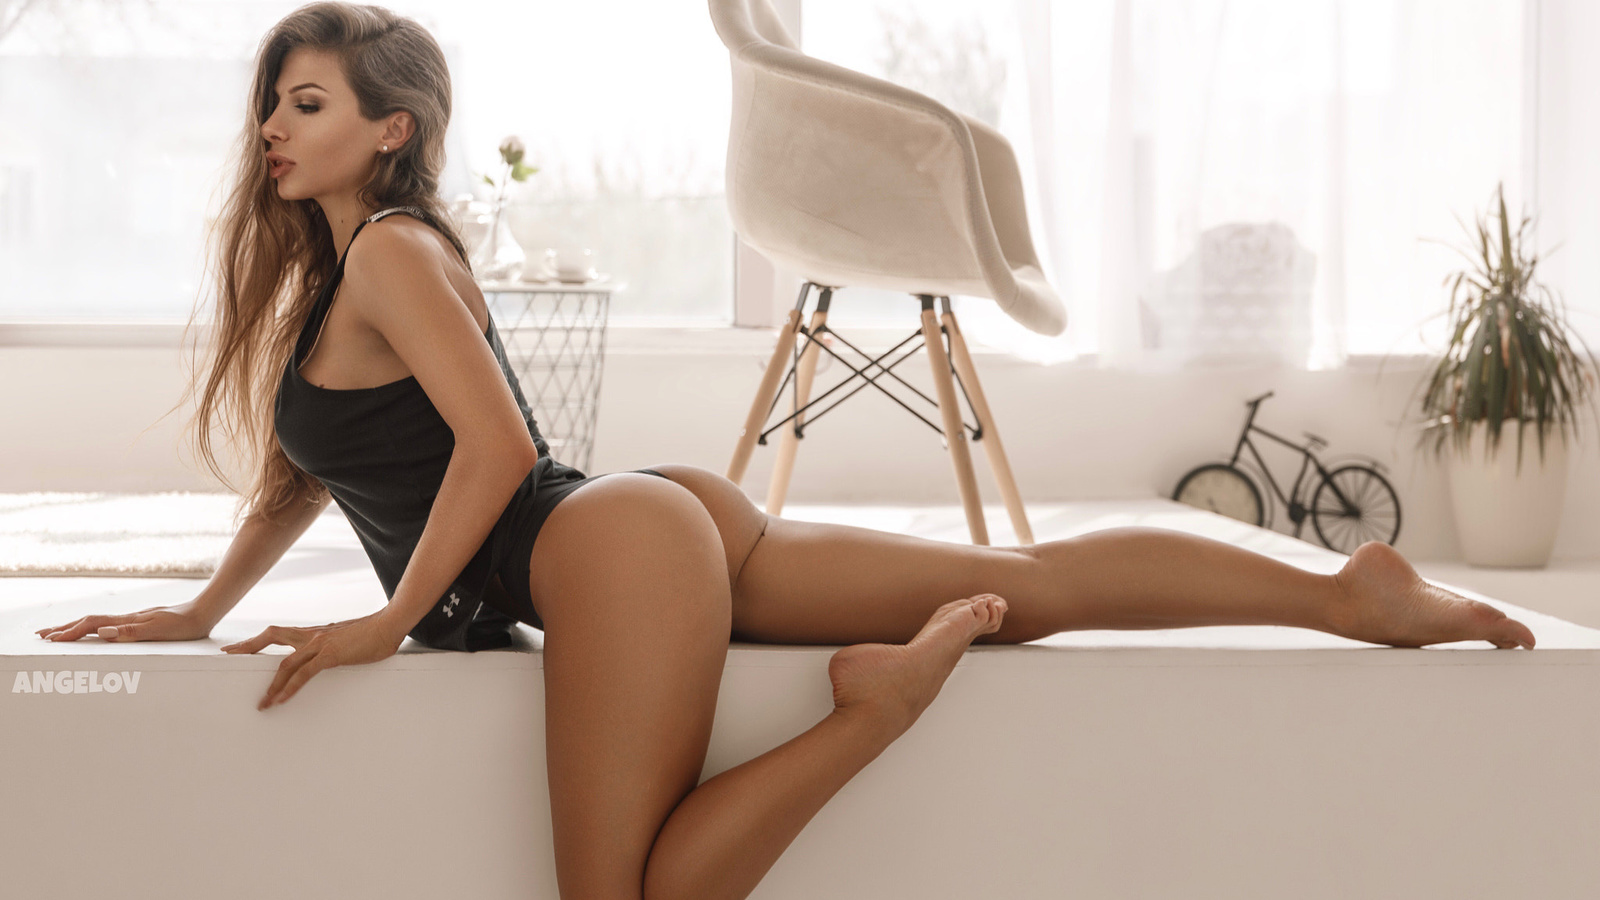 women, evgeny angelov, ass, brunette, tank top, chair, black panties, long hair